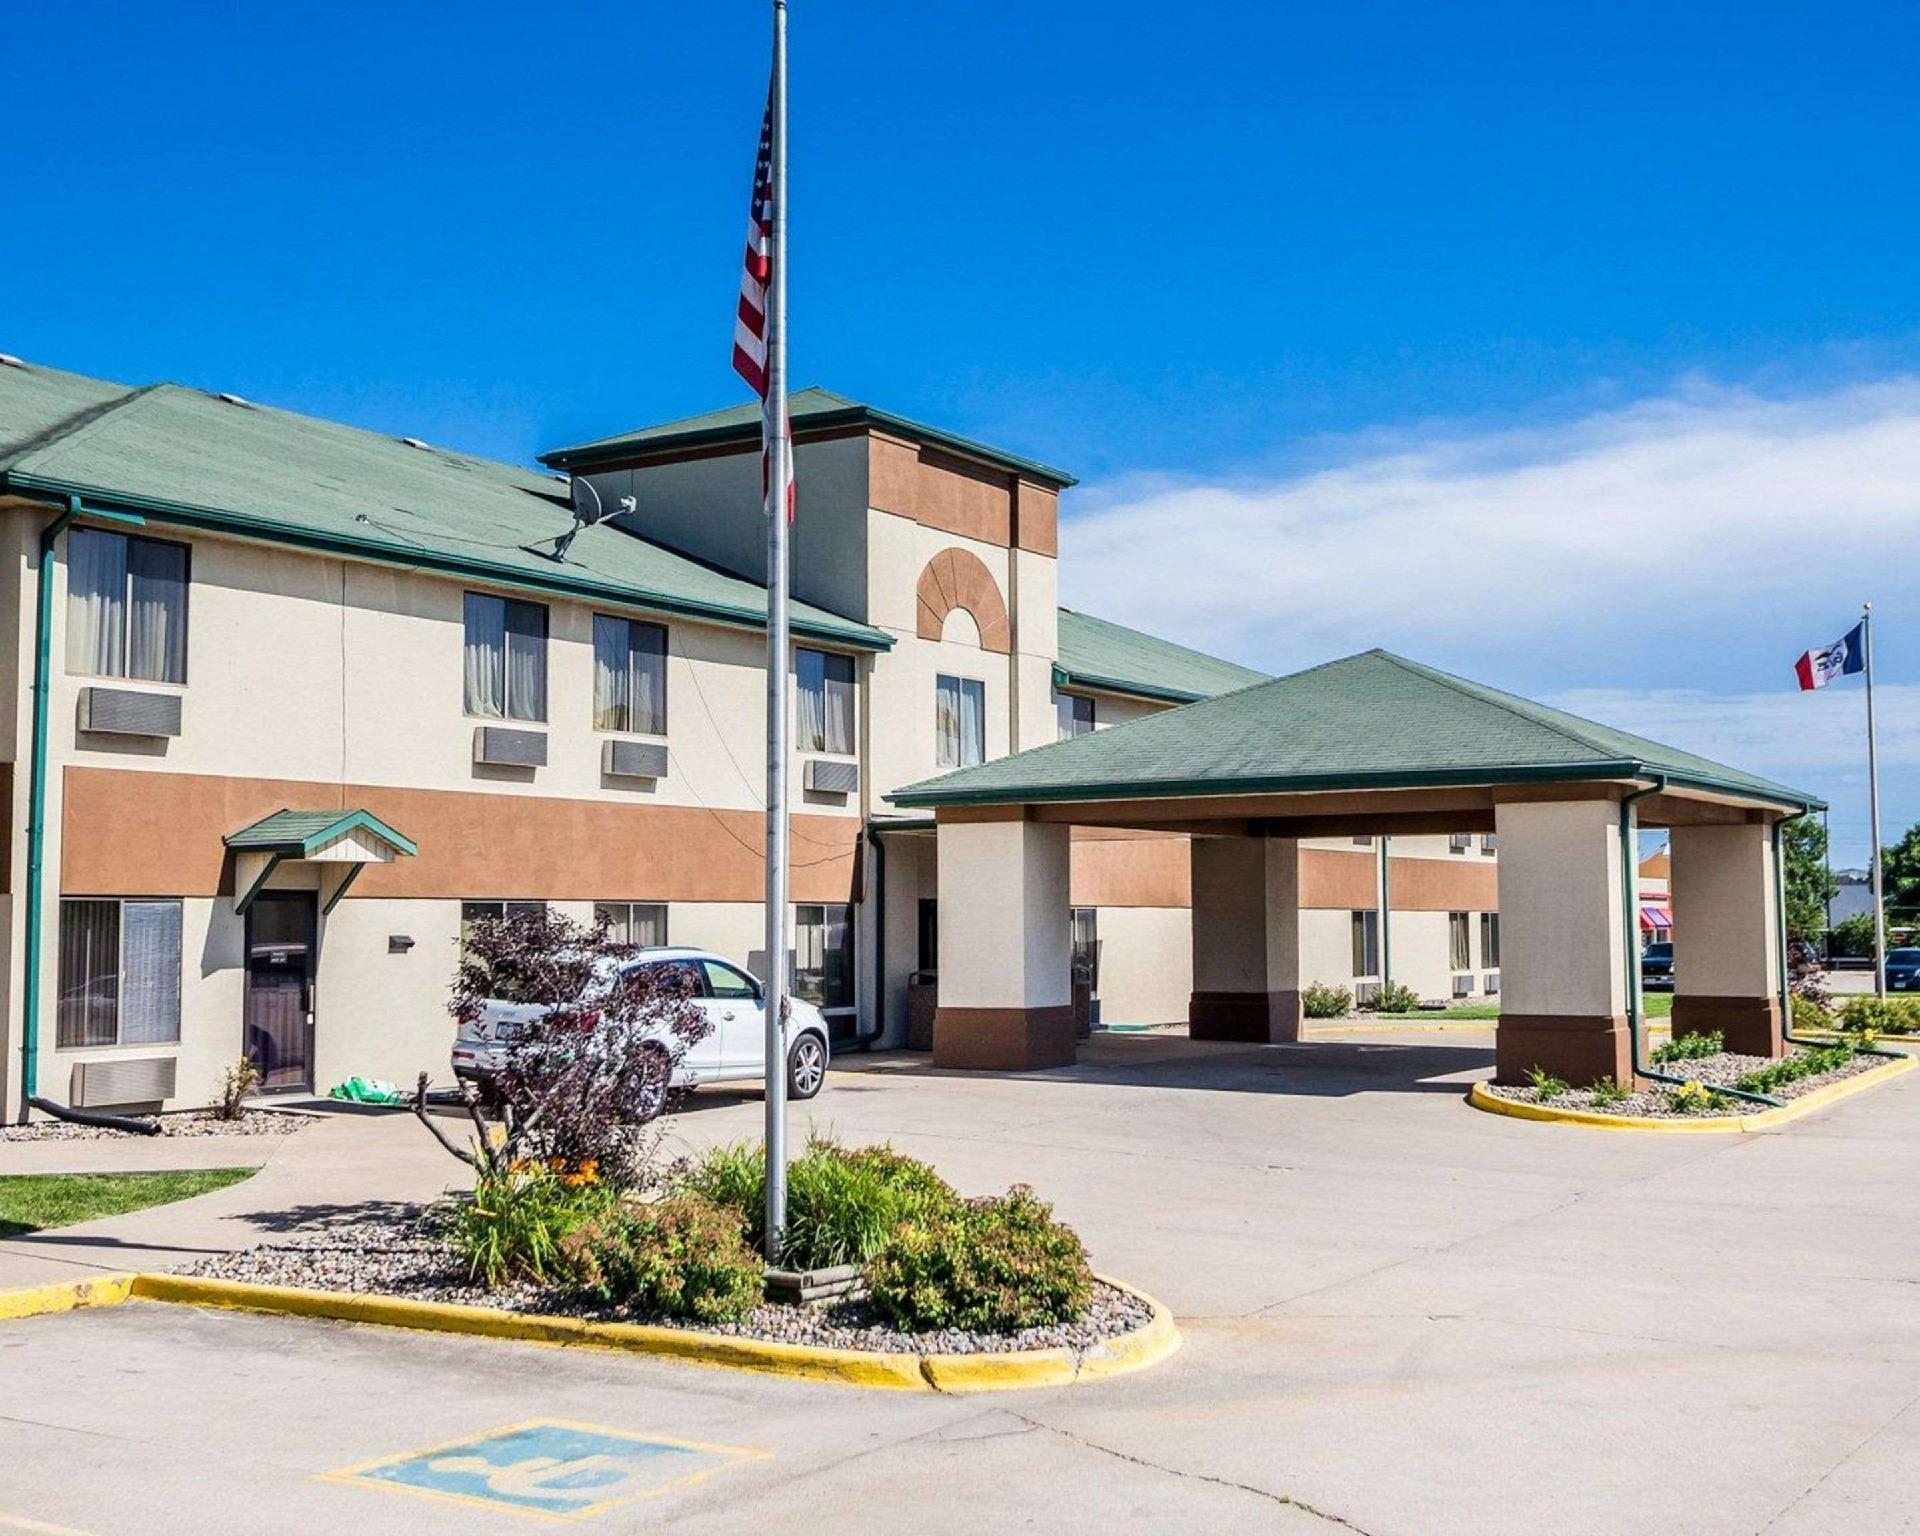 Quality Inn And Suites Altoona   Des Moines